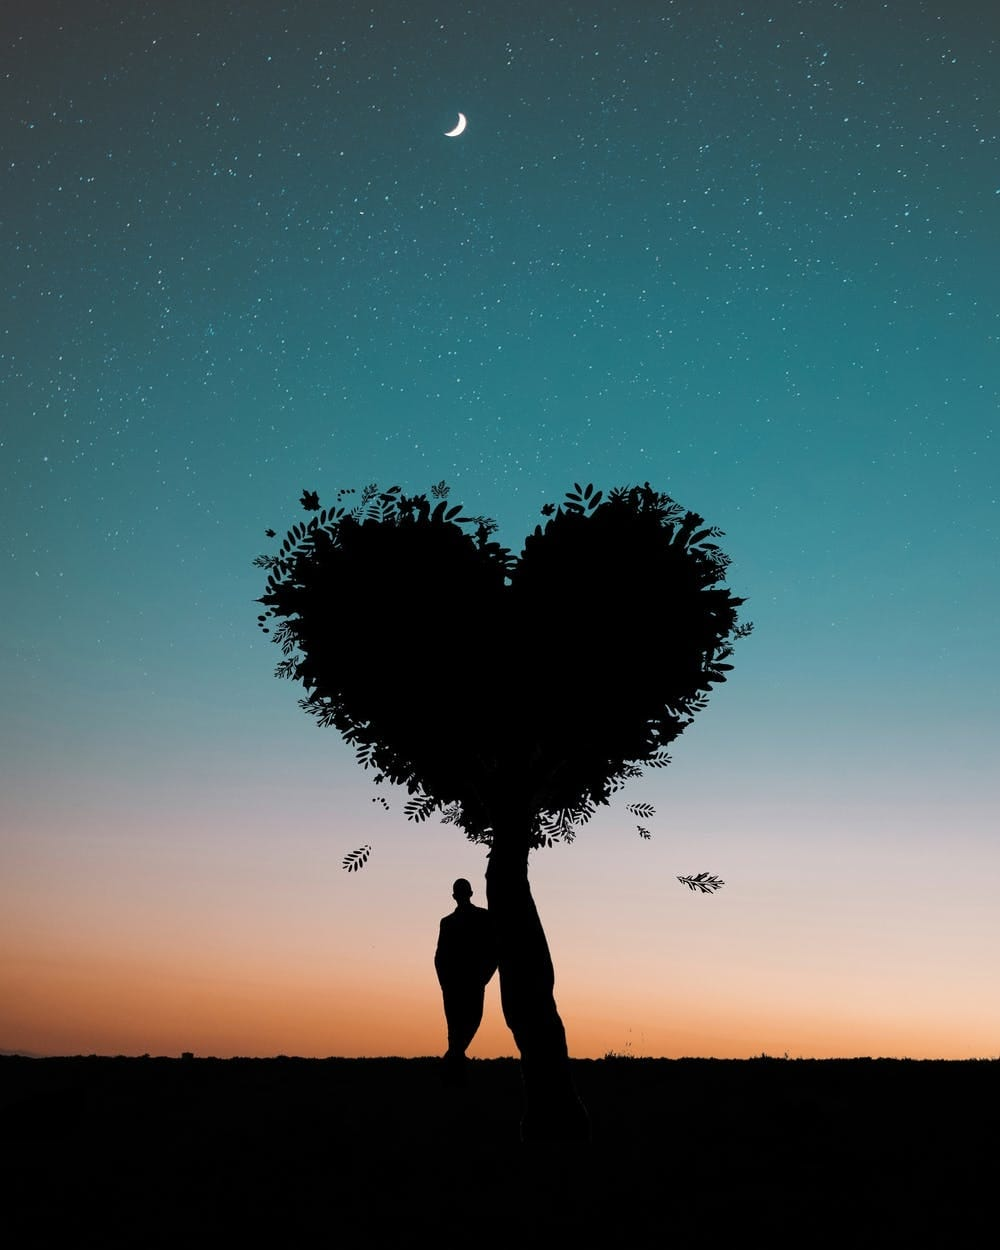 #goodmorning-roposo #goodmorning #capturedchannel #caputretv #captured #wallpapers #images #photo #love #roposo-goodnight #night #roposo-morning #photographyislife #rose #valentine #love #couple-photography #love-couple #couplegoals